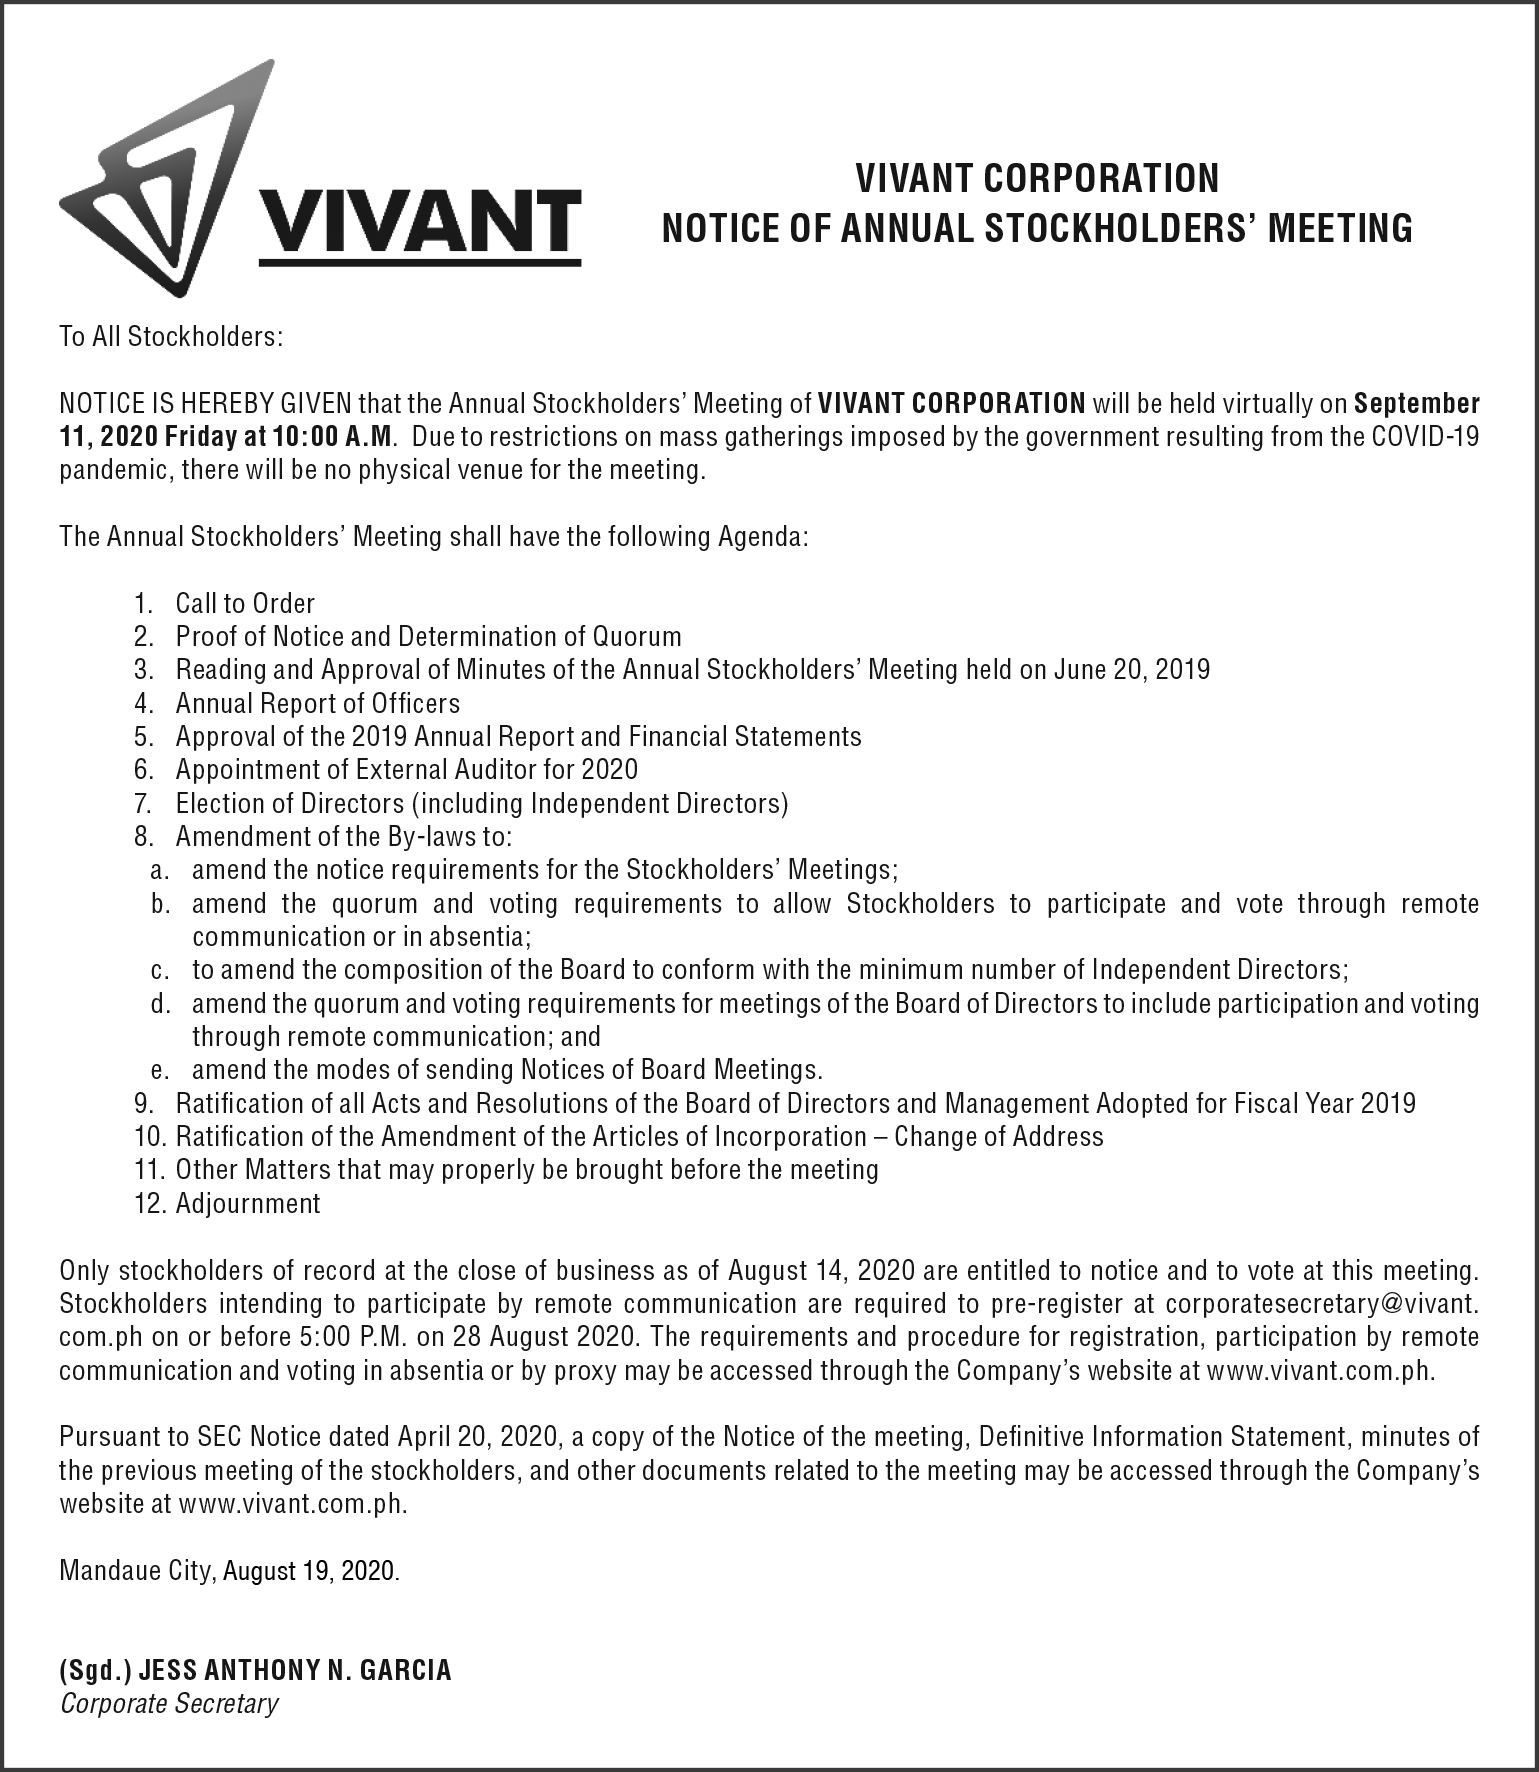 Vivant Notice AD 4x15 1 1 - Vivant Corporation sets virtual annual stockholders' meeting on September 11